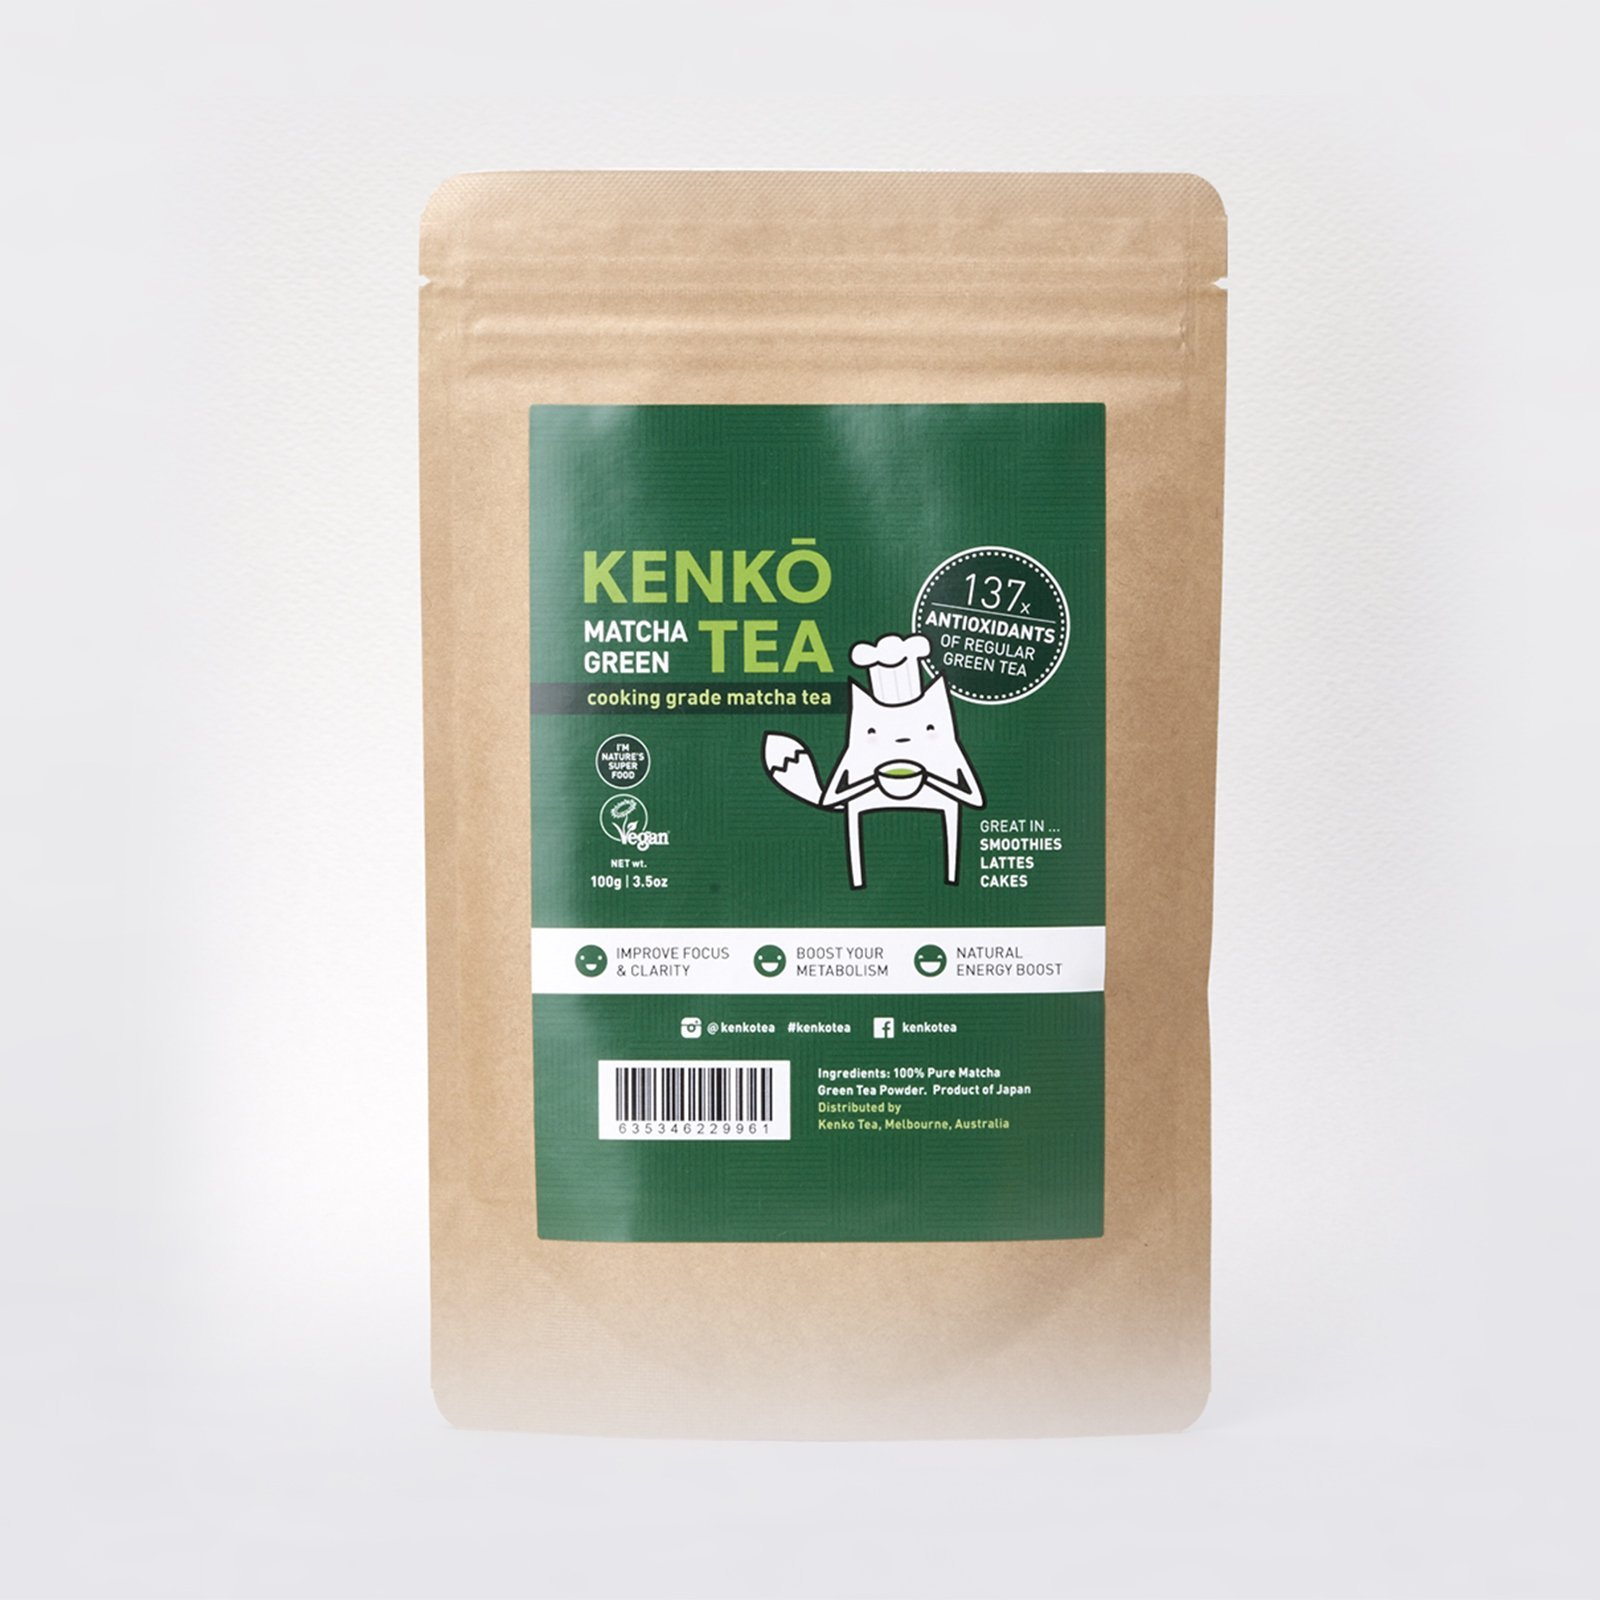 Kenko Tea Premium Matcha Green Tea Powder, Culinary Grade 100g